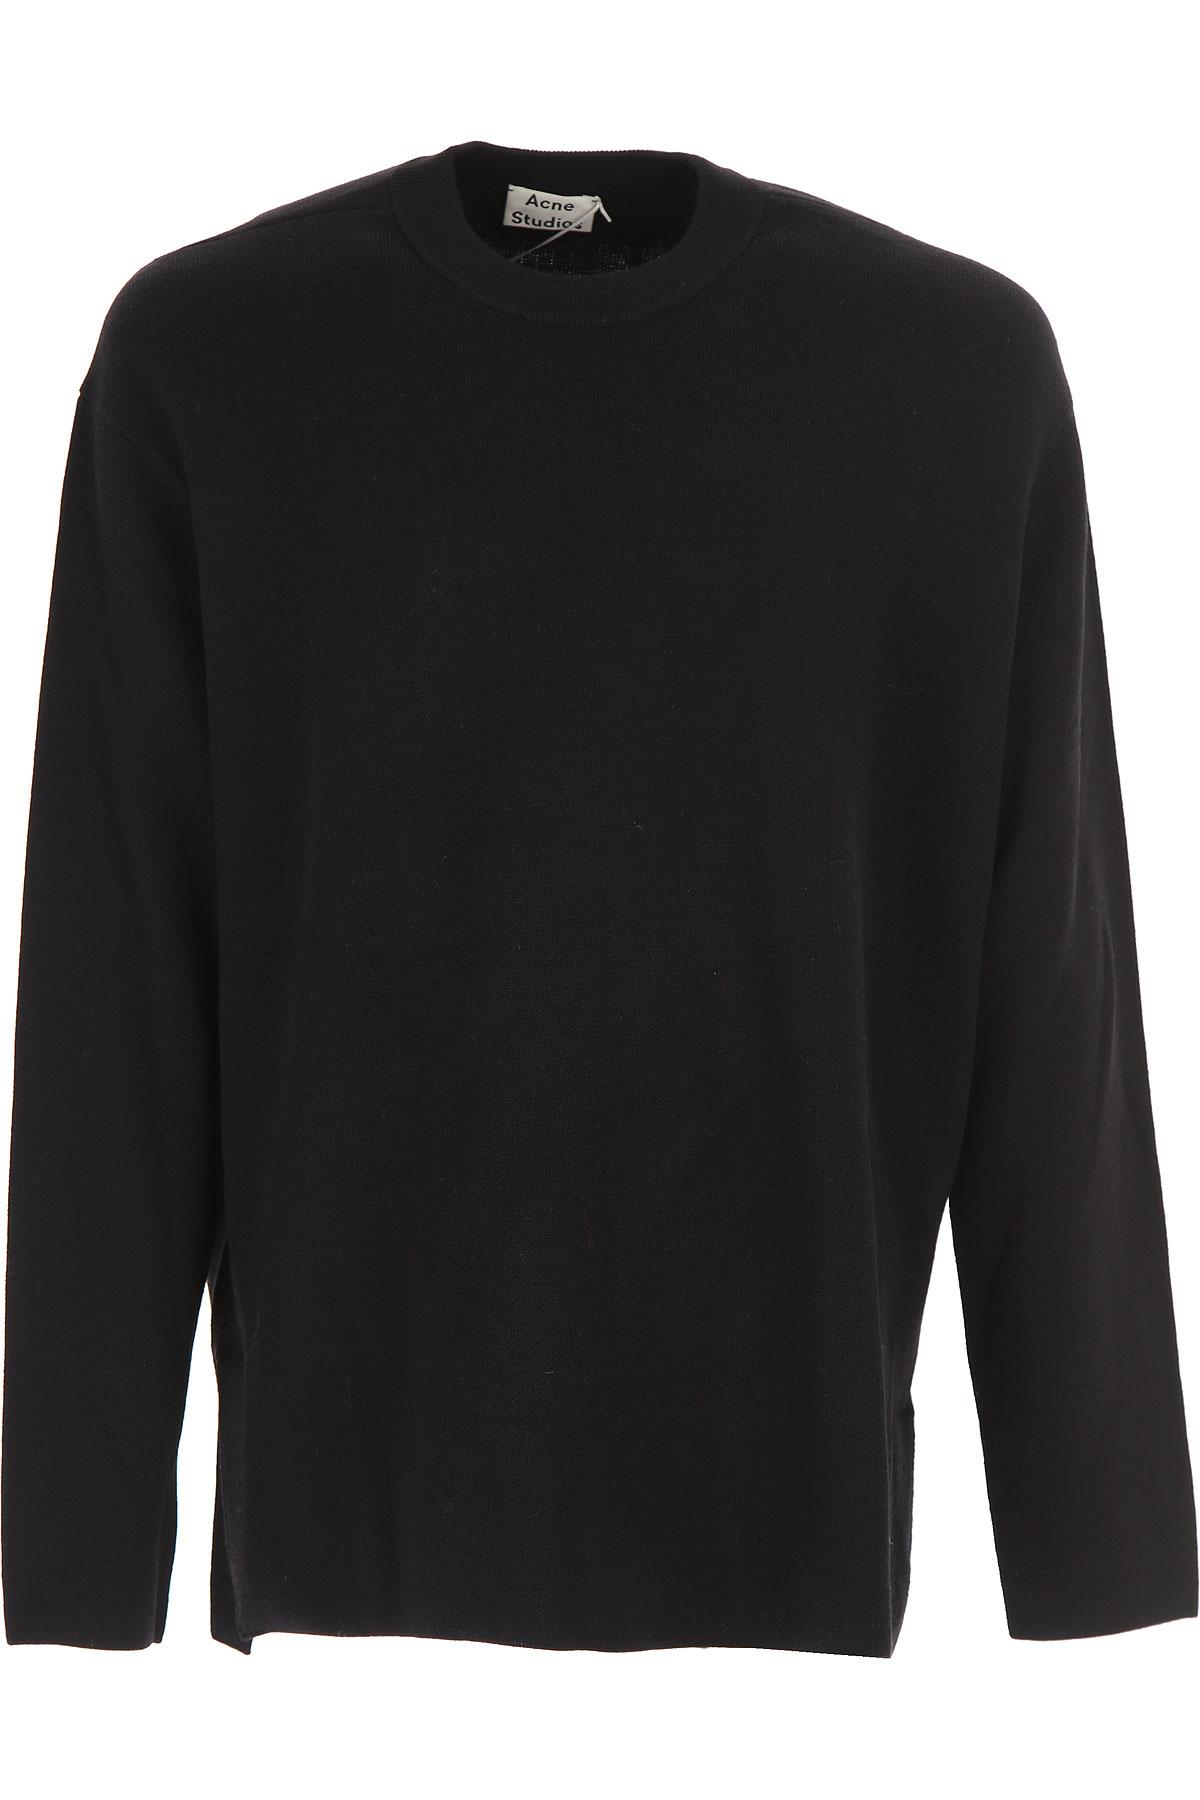 Image of Acne Studios Sweater for Men Jumper, Black, merino wool, 2017, L M S